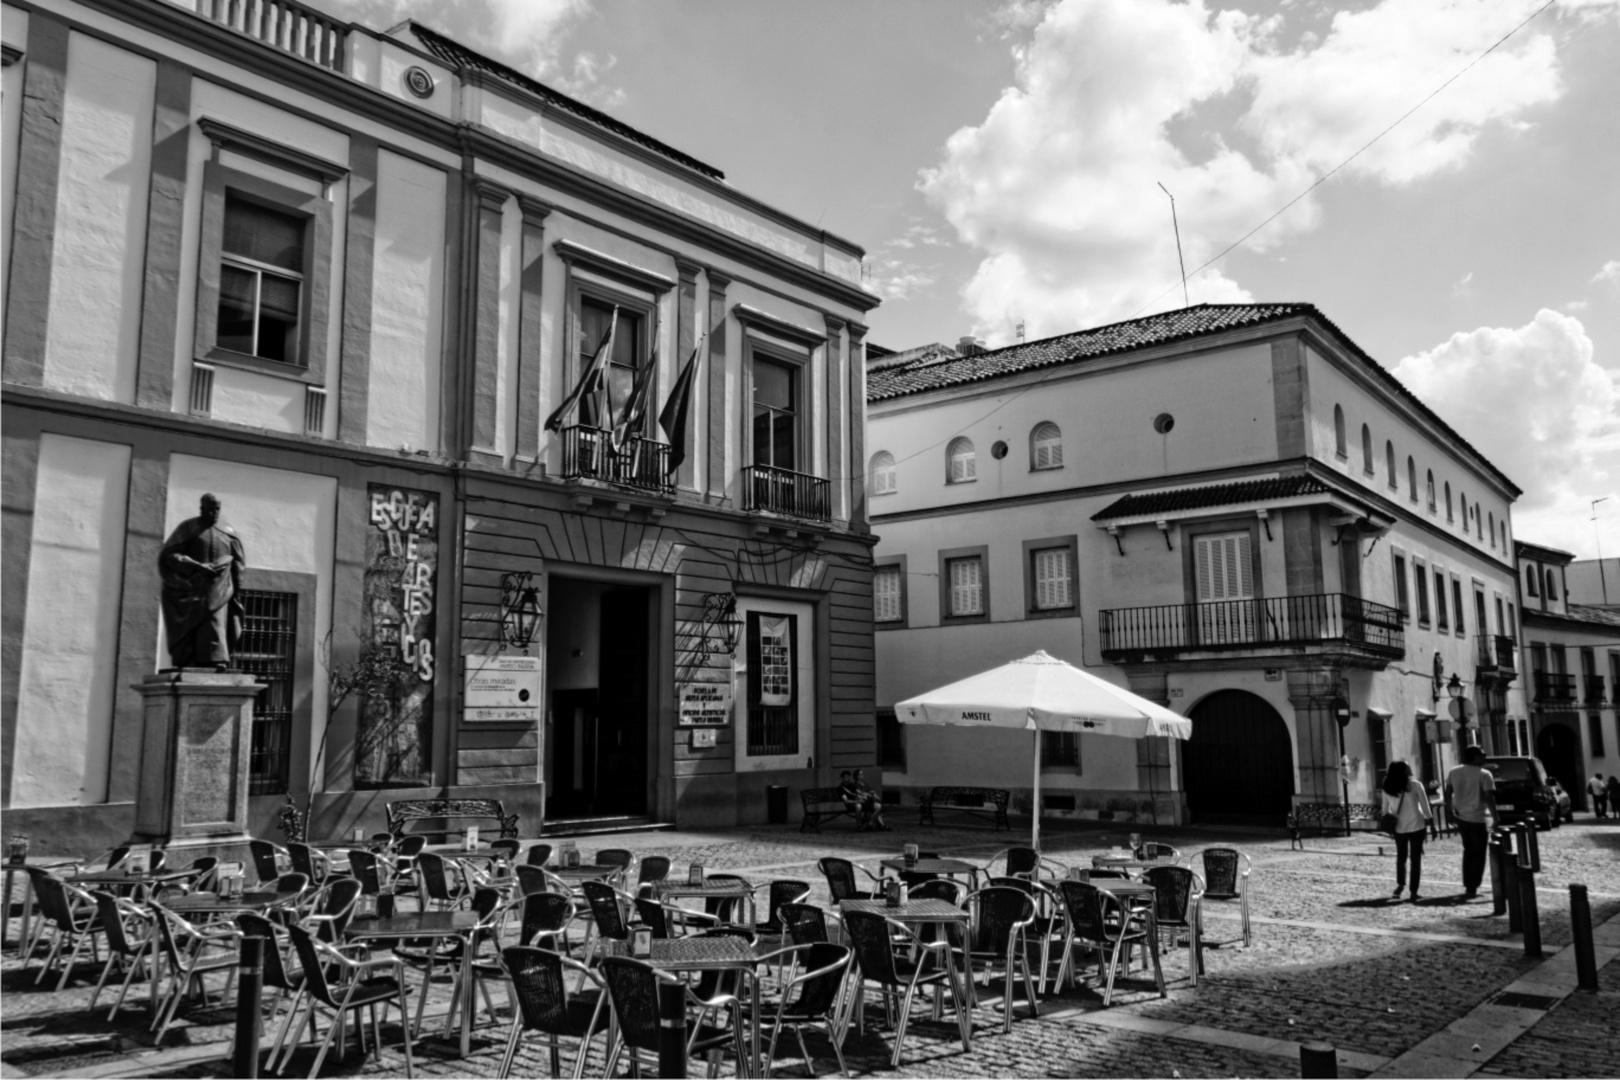 Stadtansicht in Cordoba